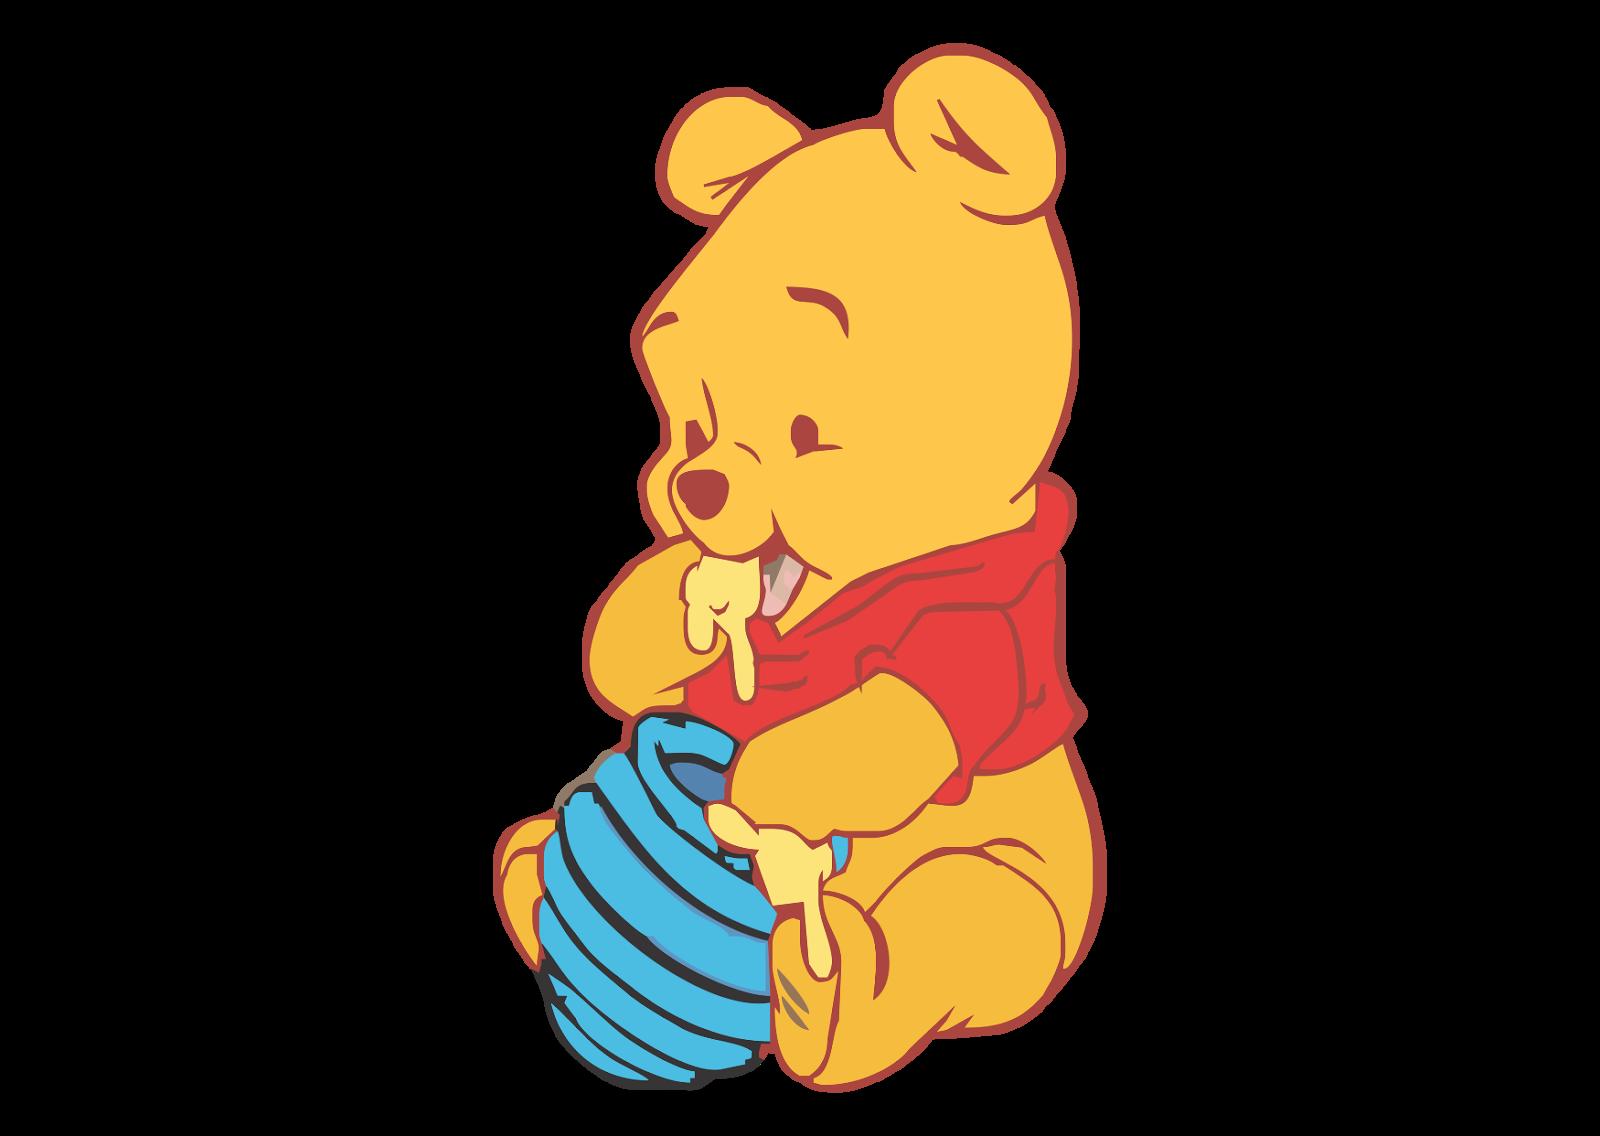 Baby Pooh Logo Vector Winnie the pooh, Pooh, Vector logo